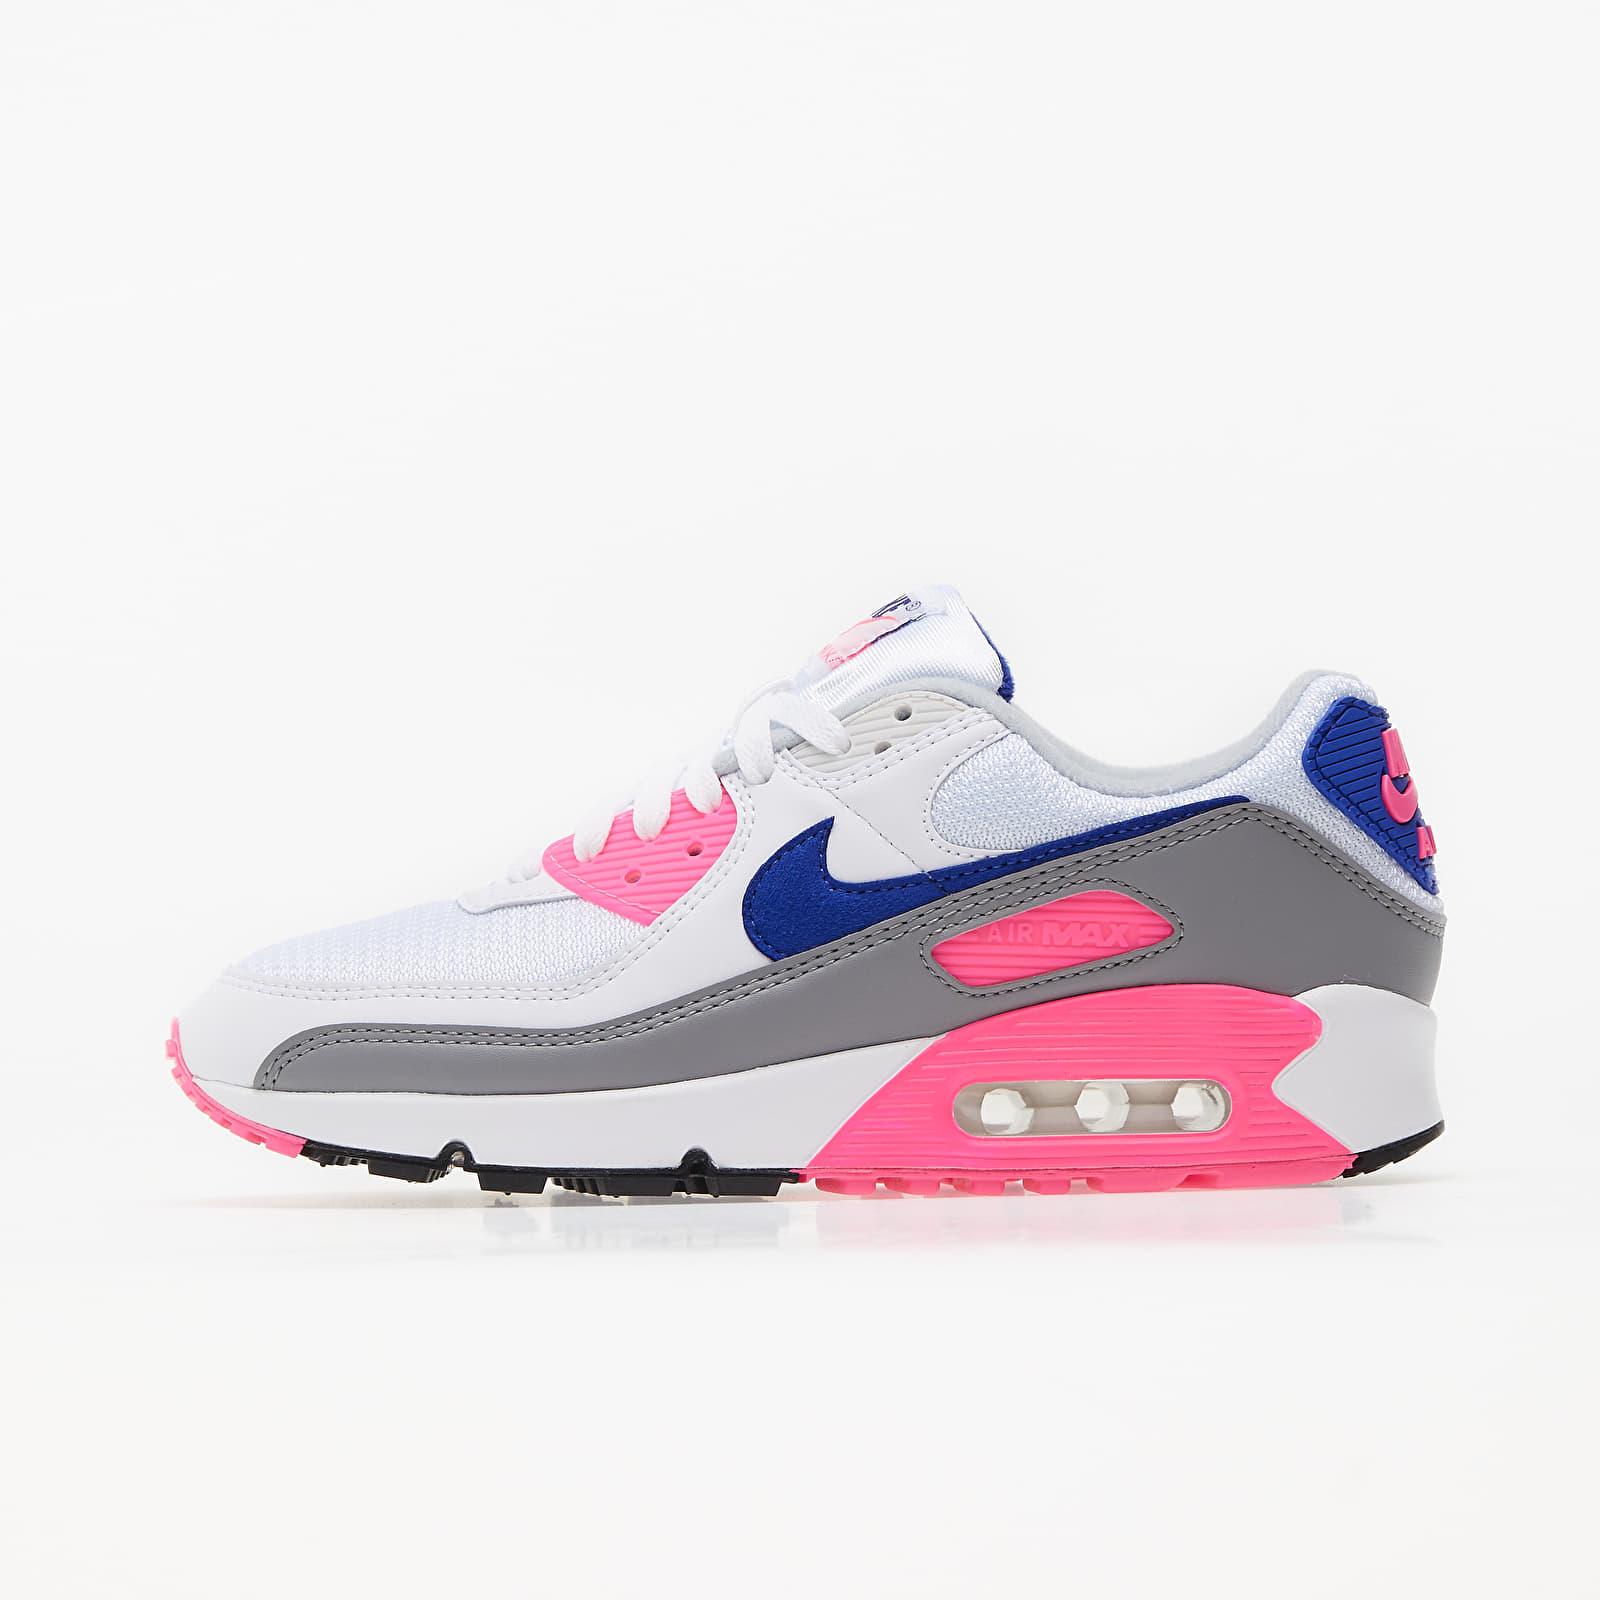 Nike Air Max III White/ Vast Grey-Concord-Pink Blast CT1887-100